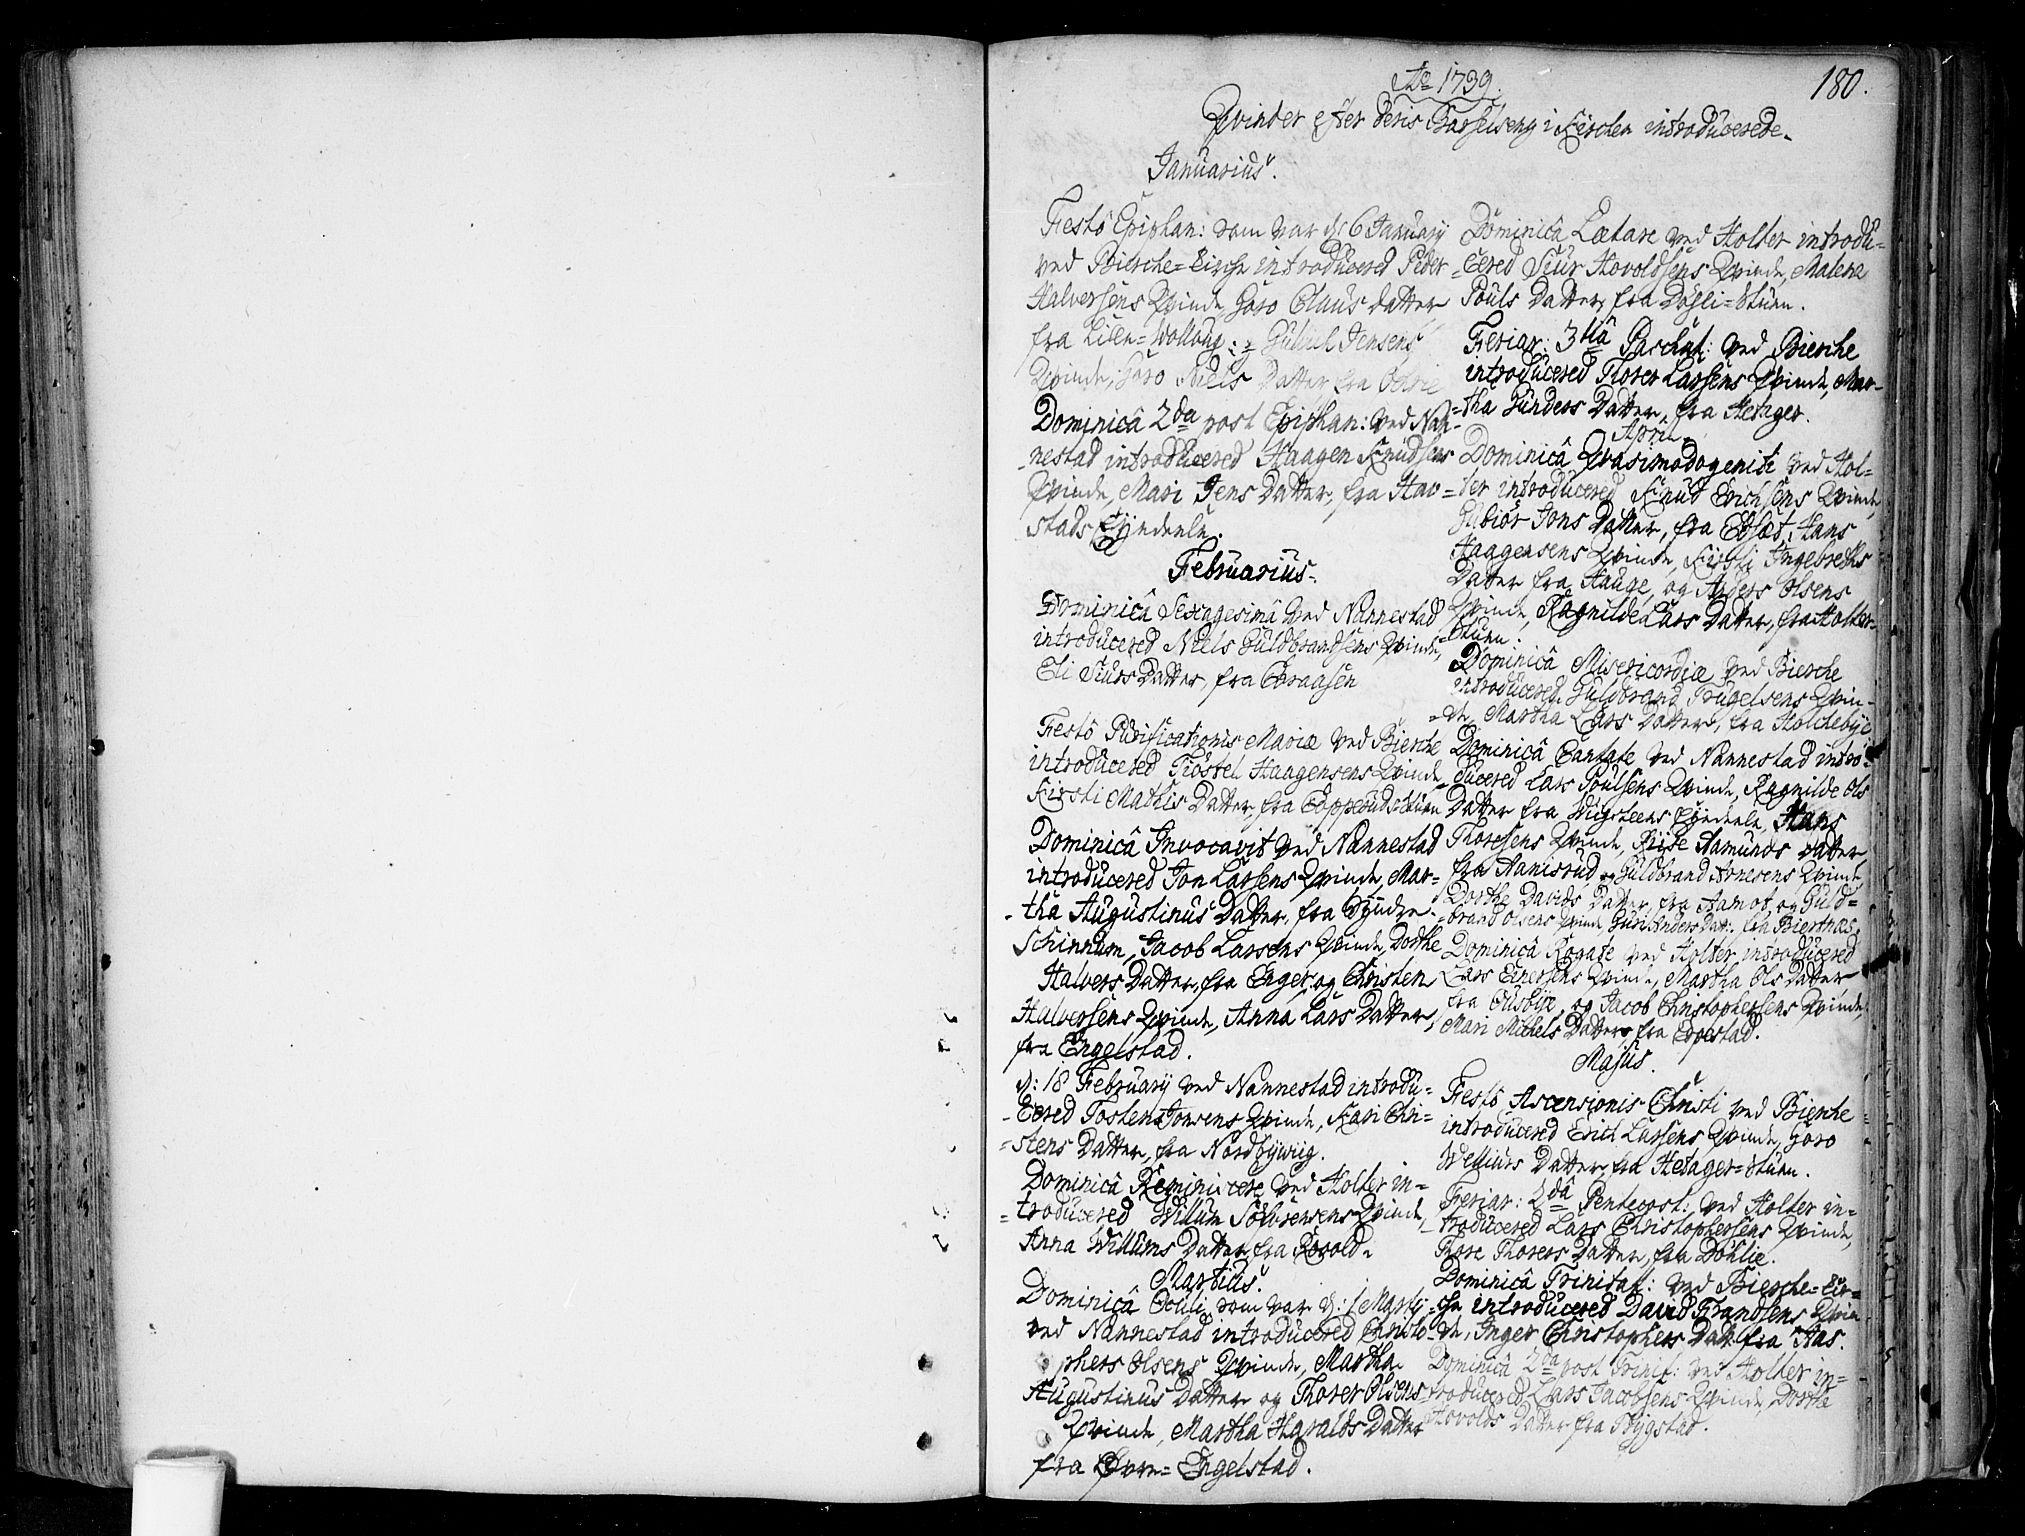 SAO, Nannestad prestekontor Kirkebøker, F/Fa/L0006: Ministerialbok nr. I 6, 1739-1754, s. 180